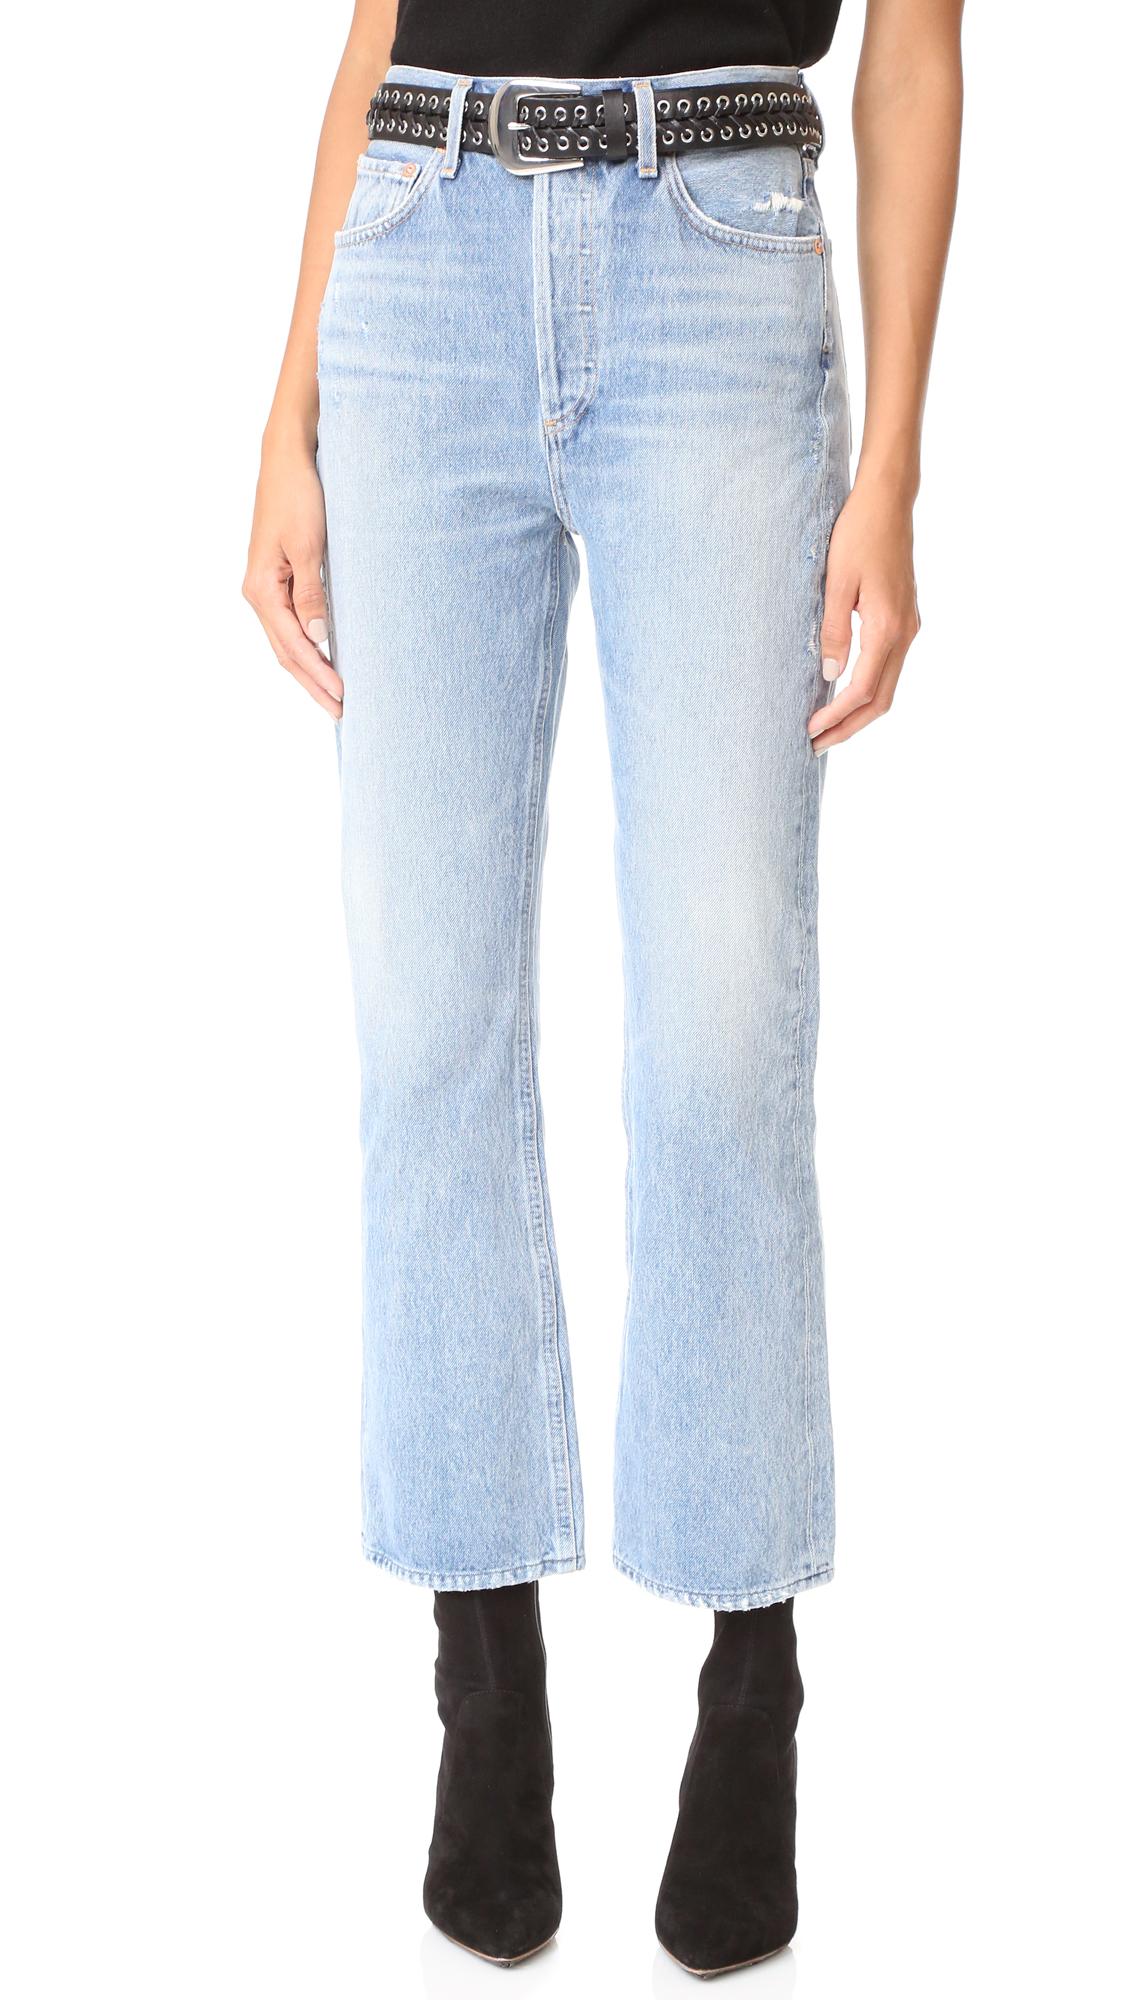 Agolde Taylor High Rise Crop Kick Flare Jeans - Blue Rock at Shopbop